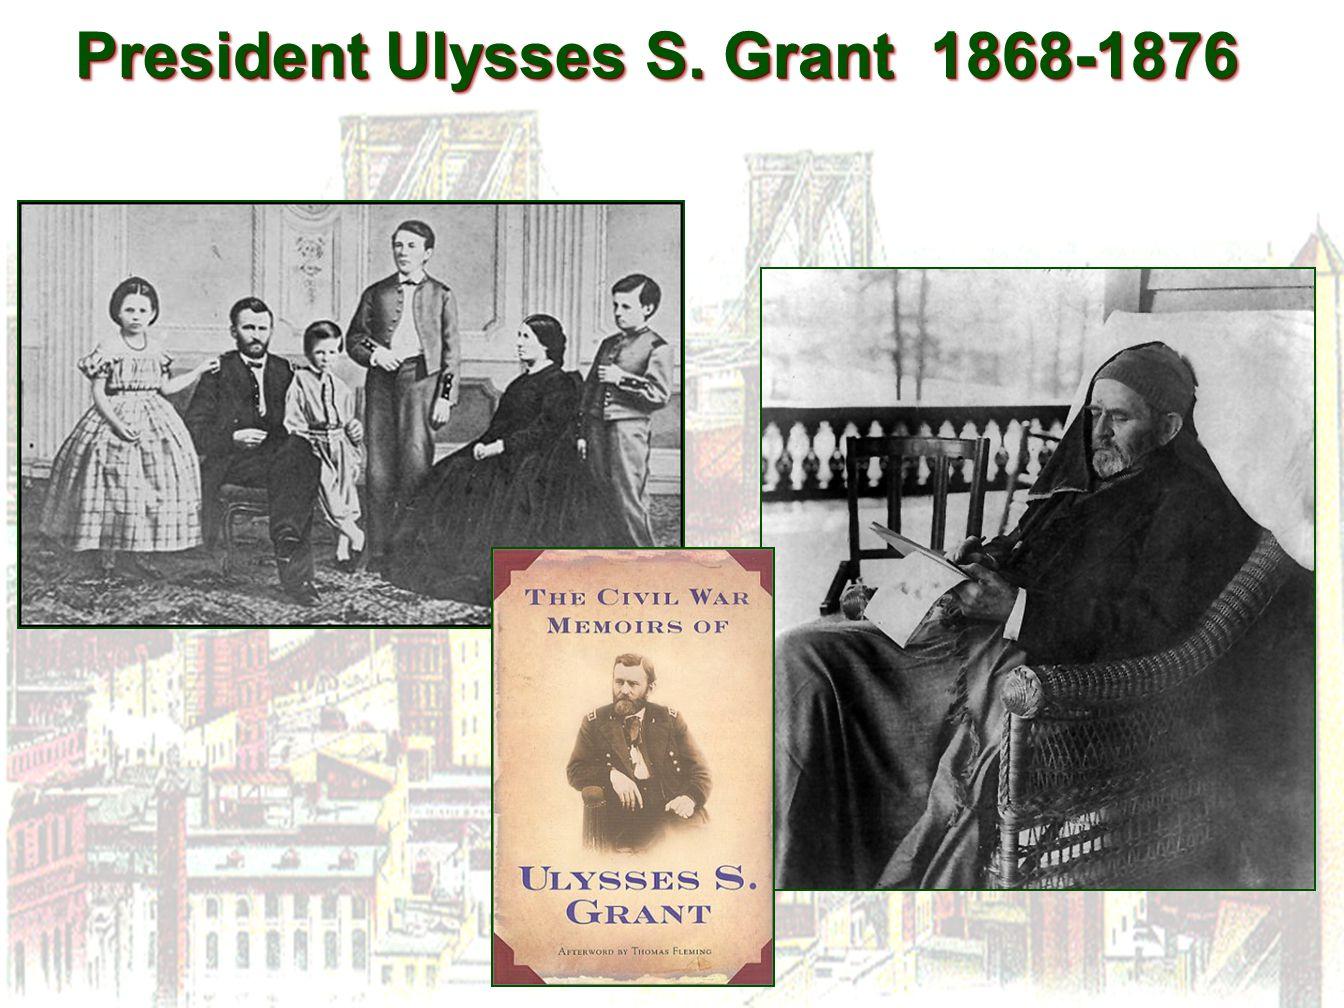 President Ulysses S. Grant 1868-1876